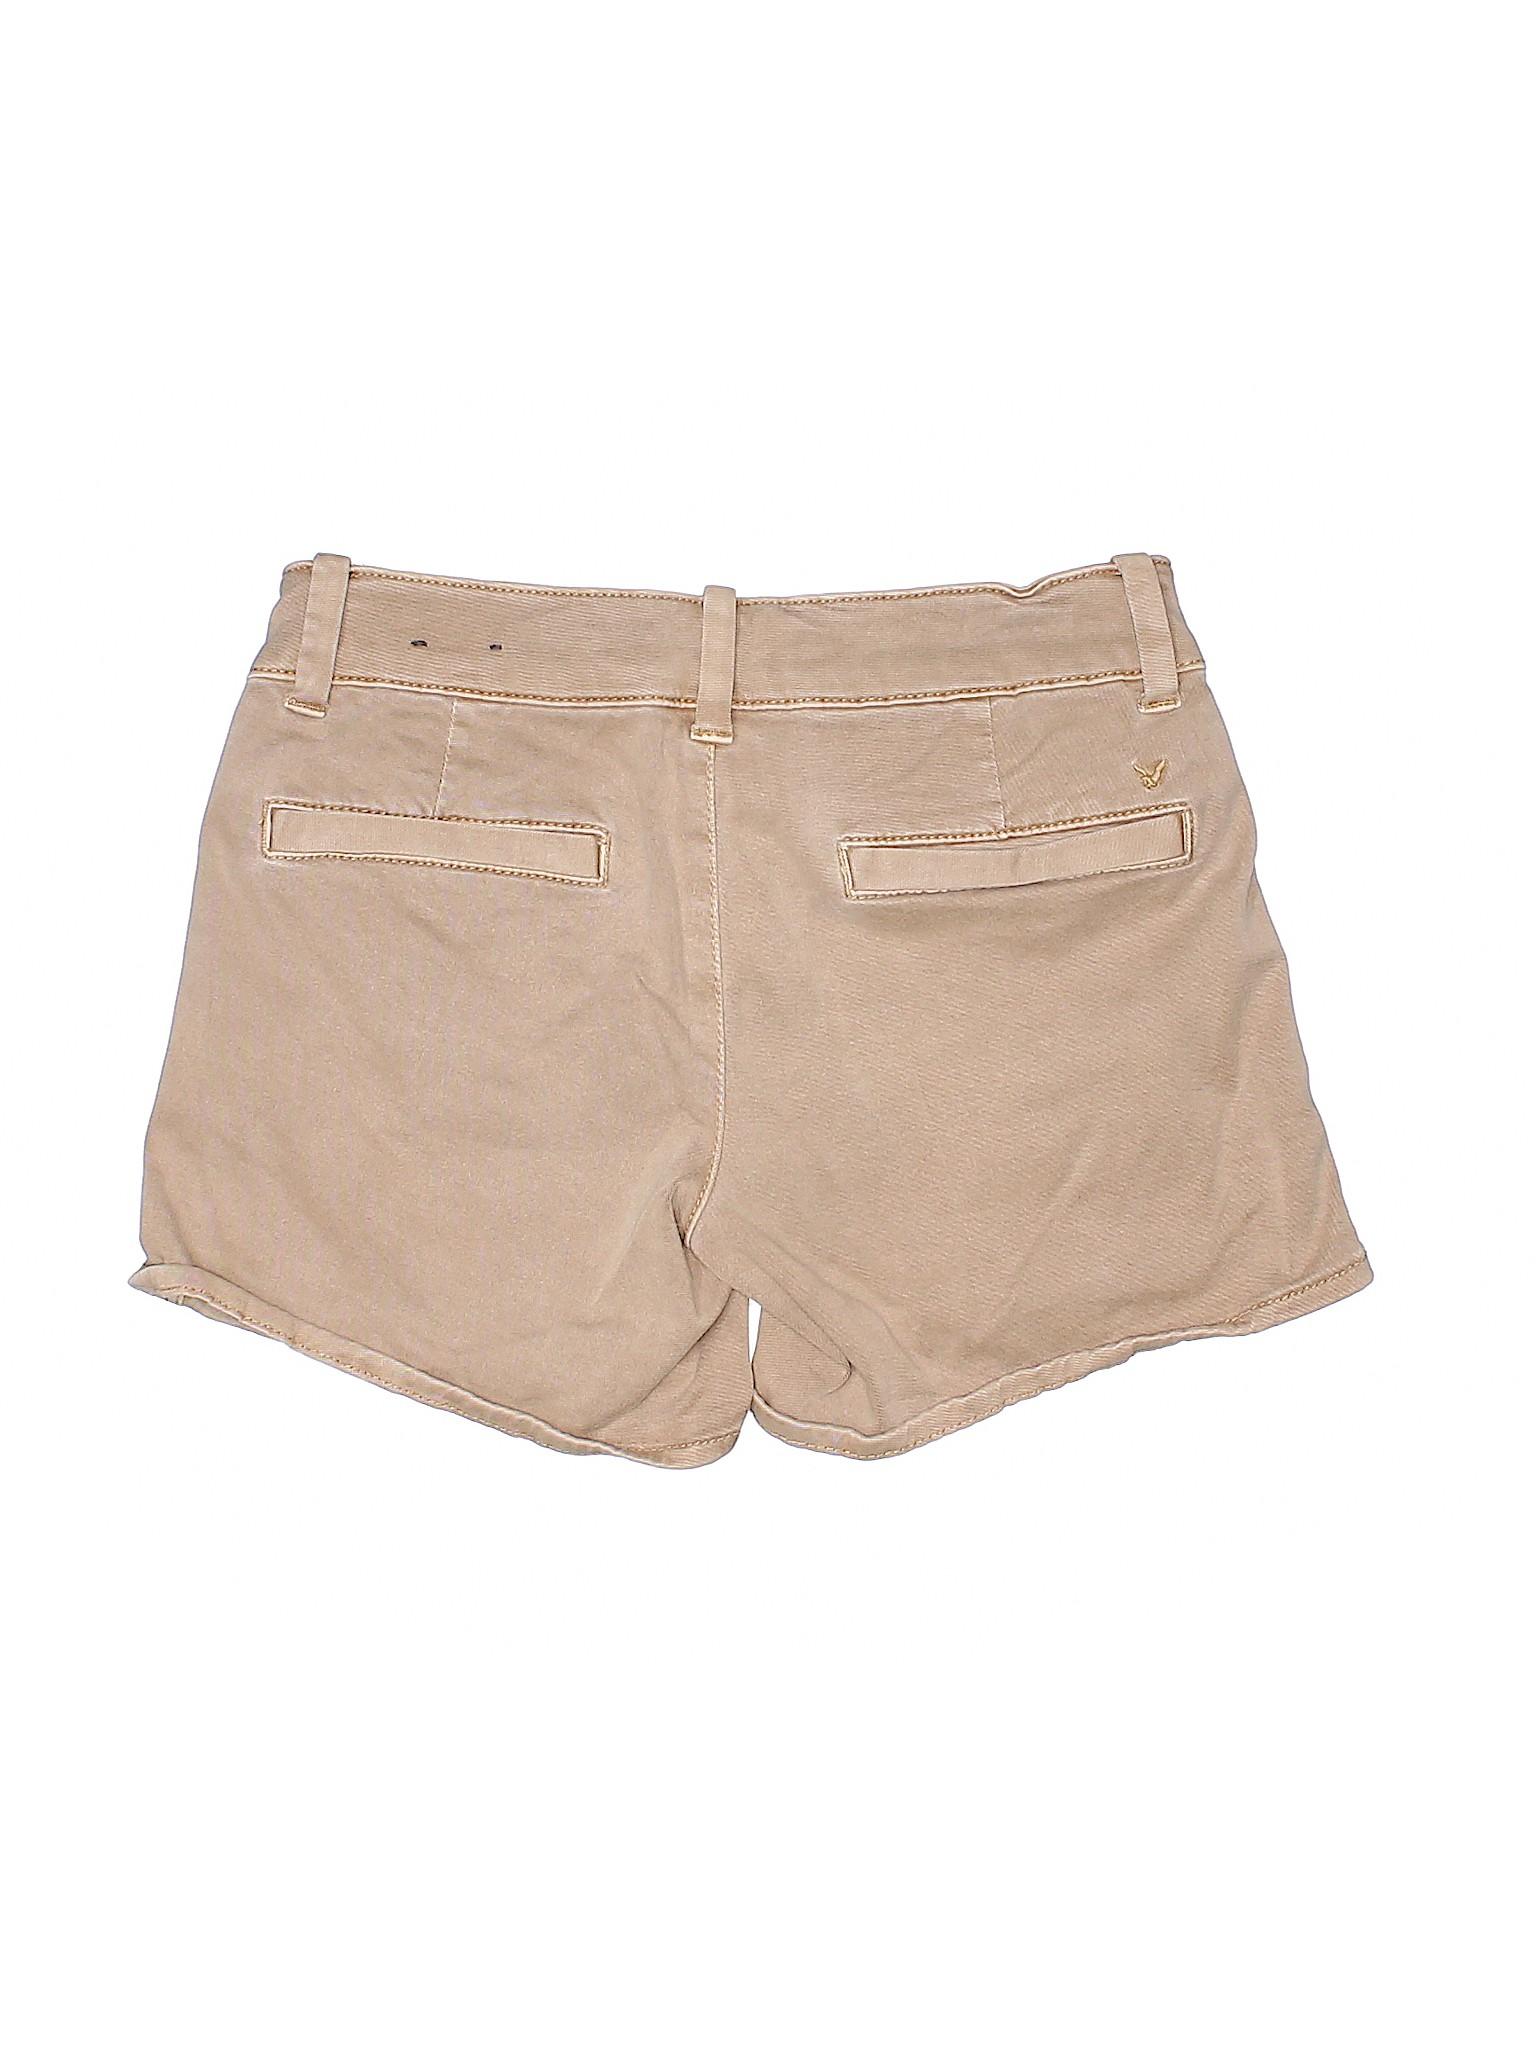 Eagle Boutique Shorts Khaki Outfitters American U656q0